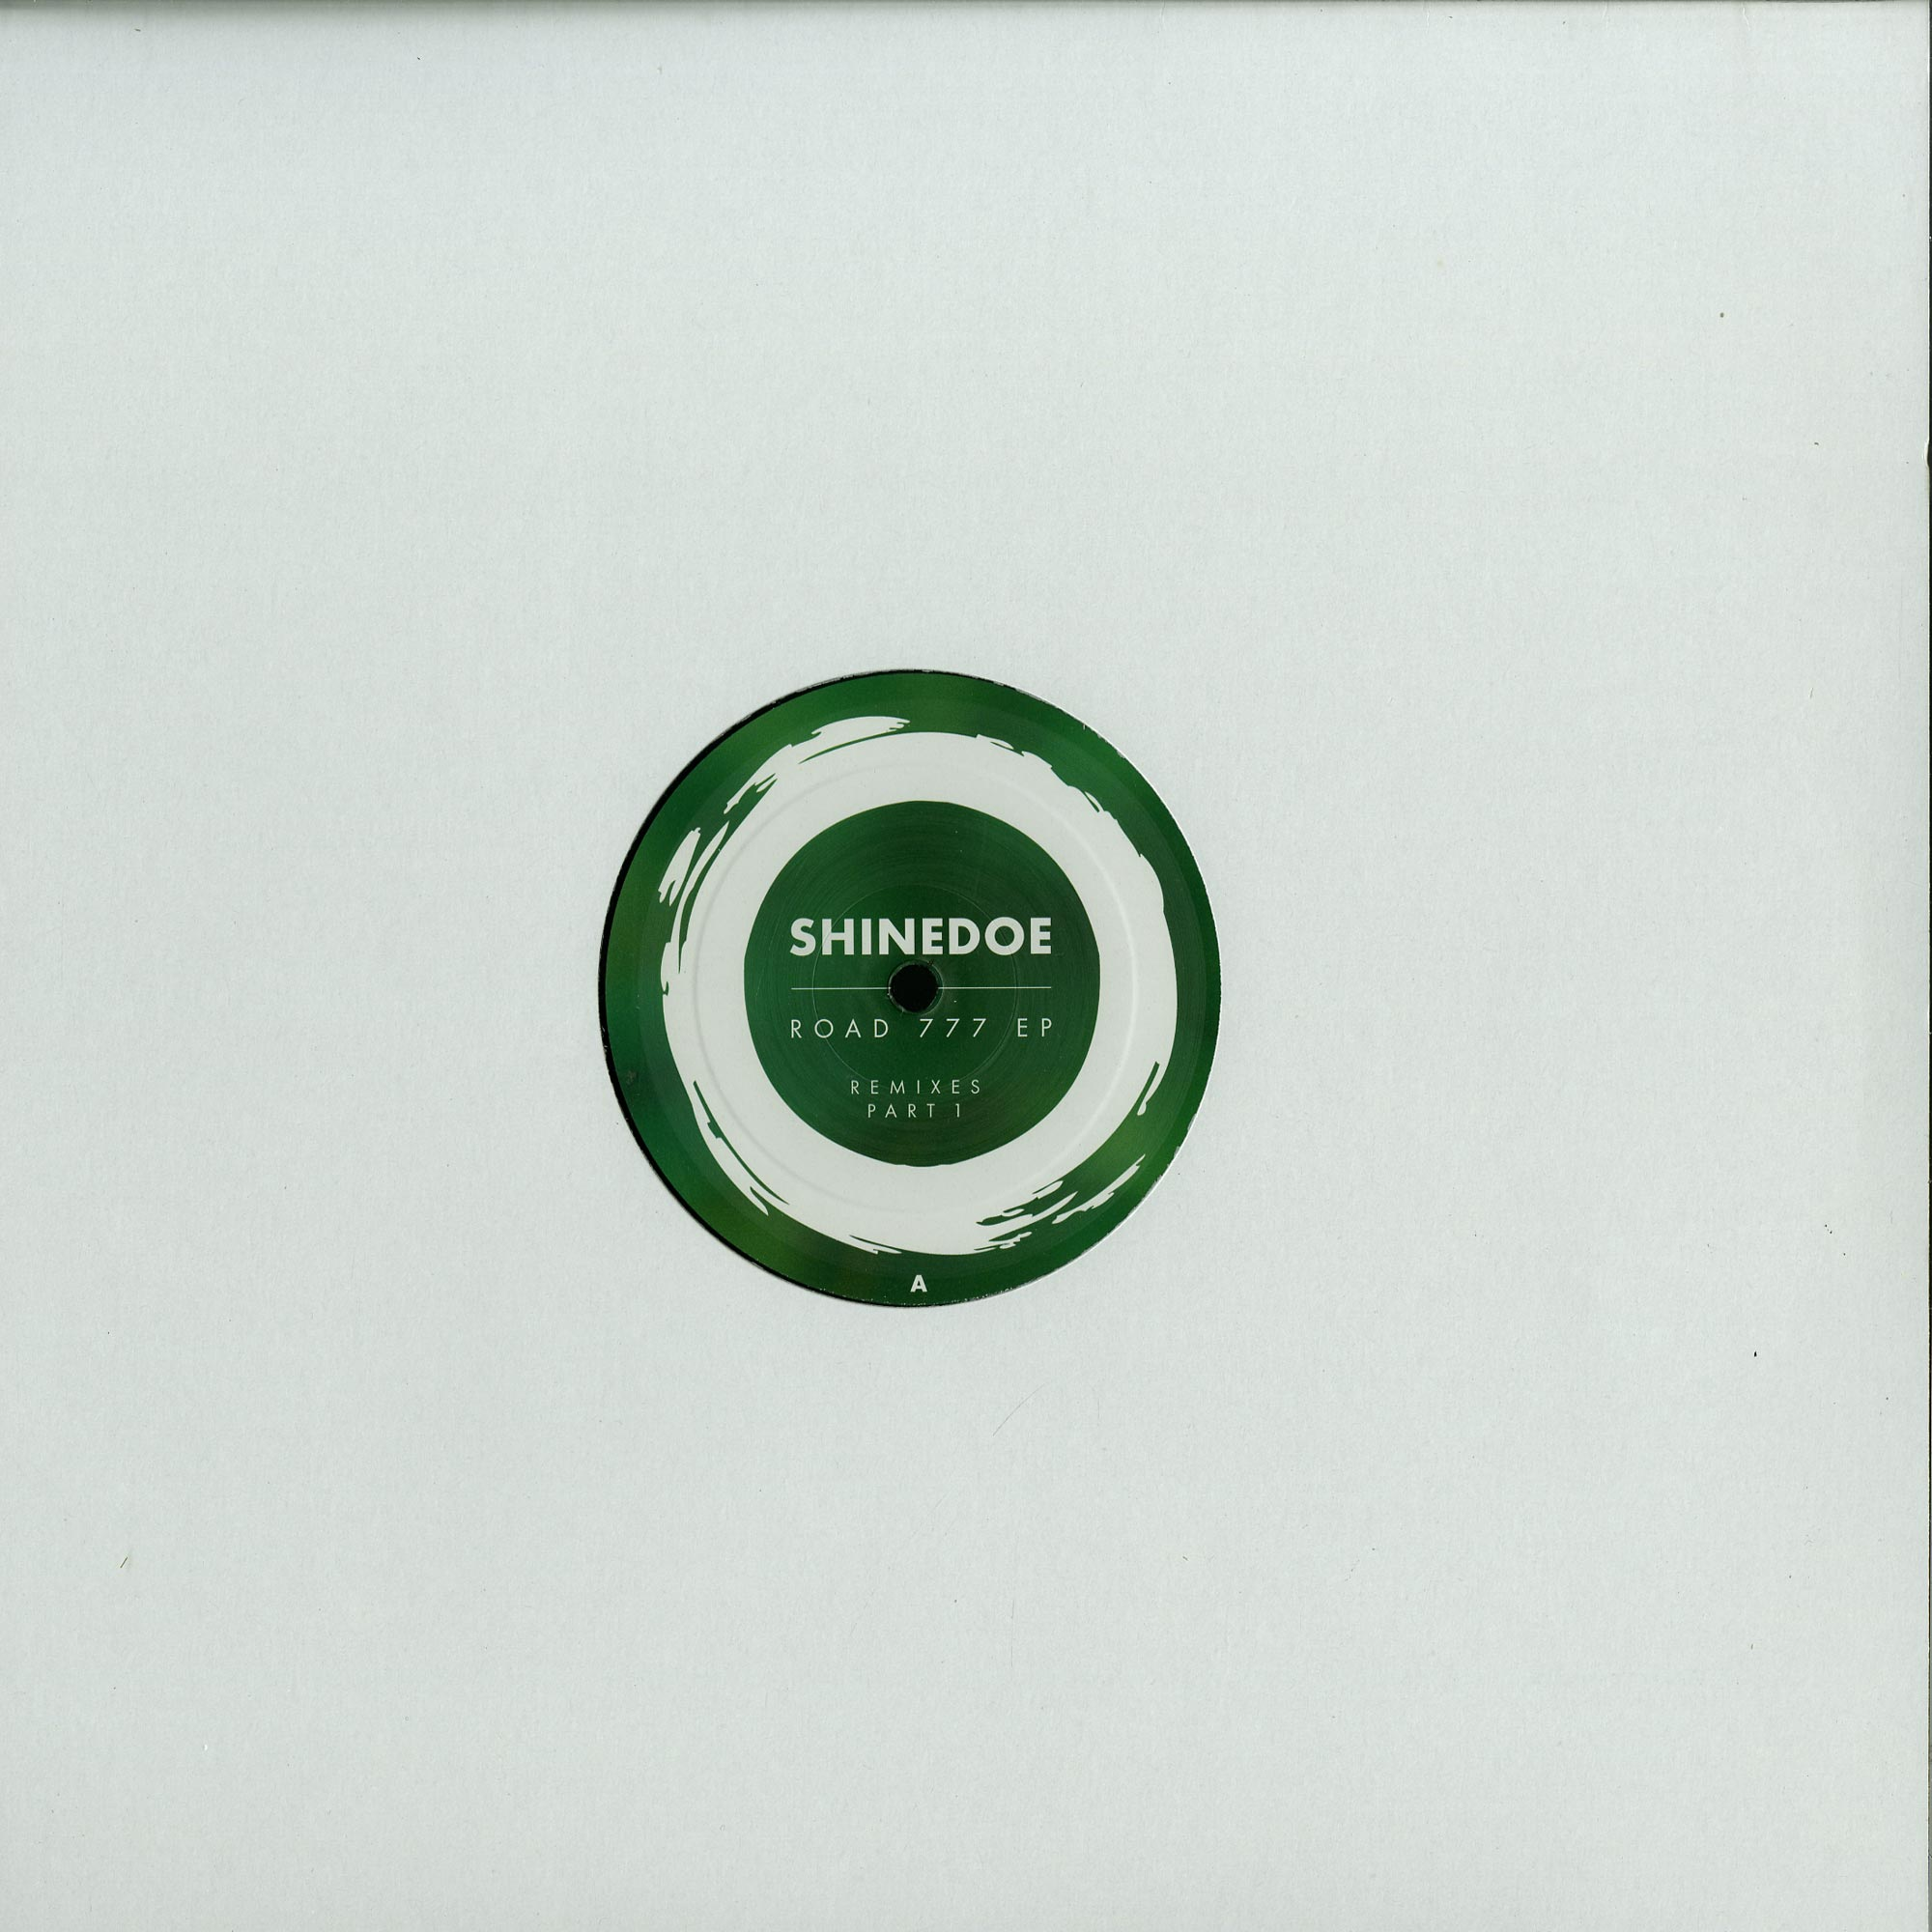 Shinedoe - ROAD 777 EP REMIXES PART 1